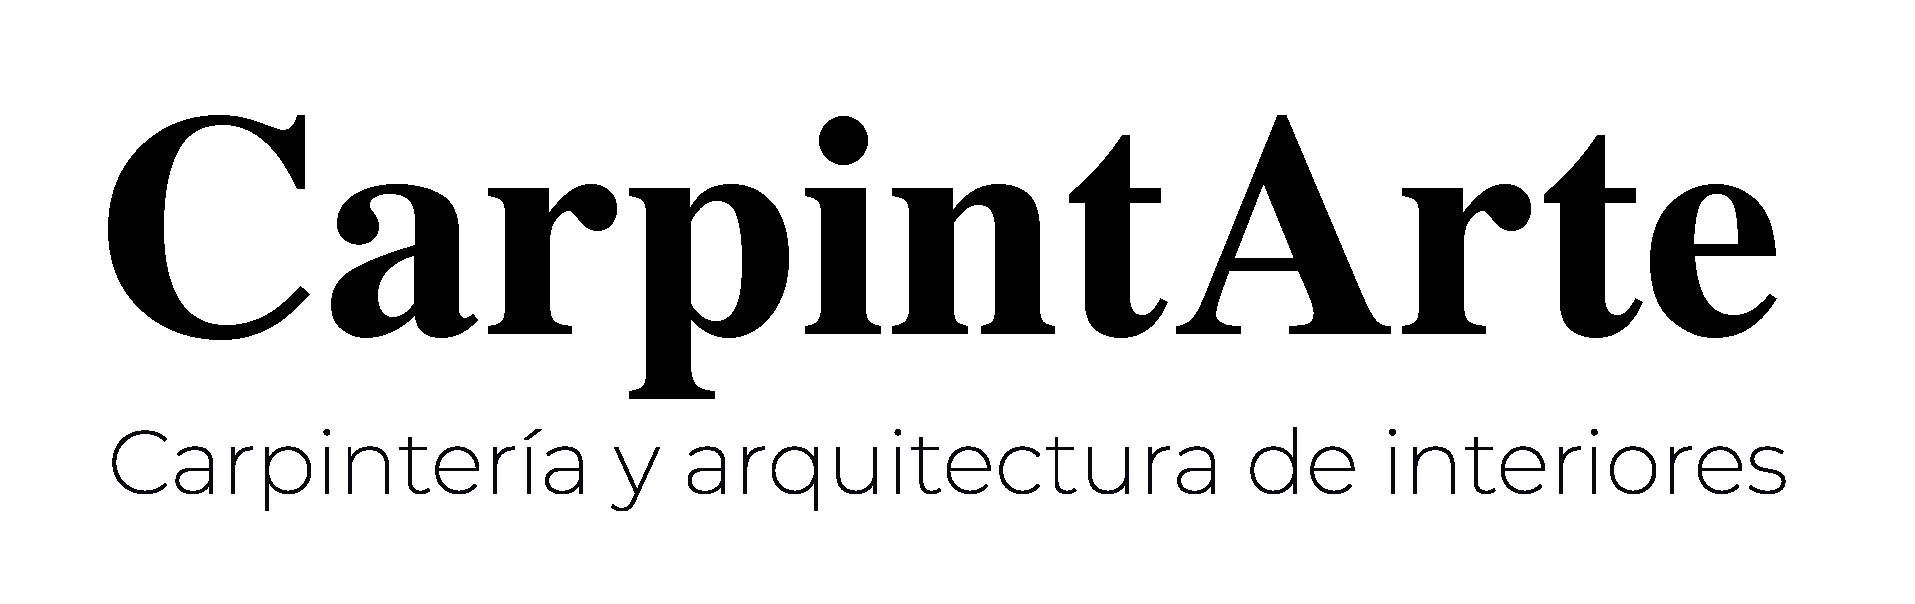 Carpintarte